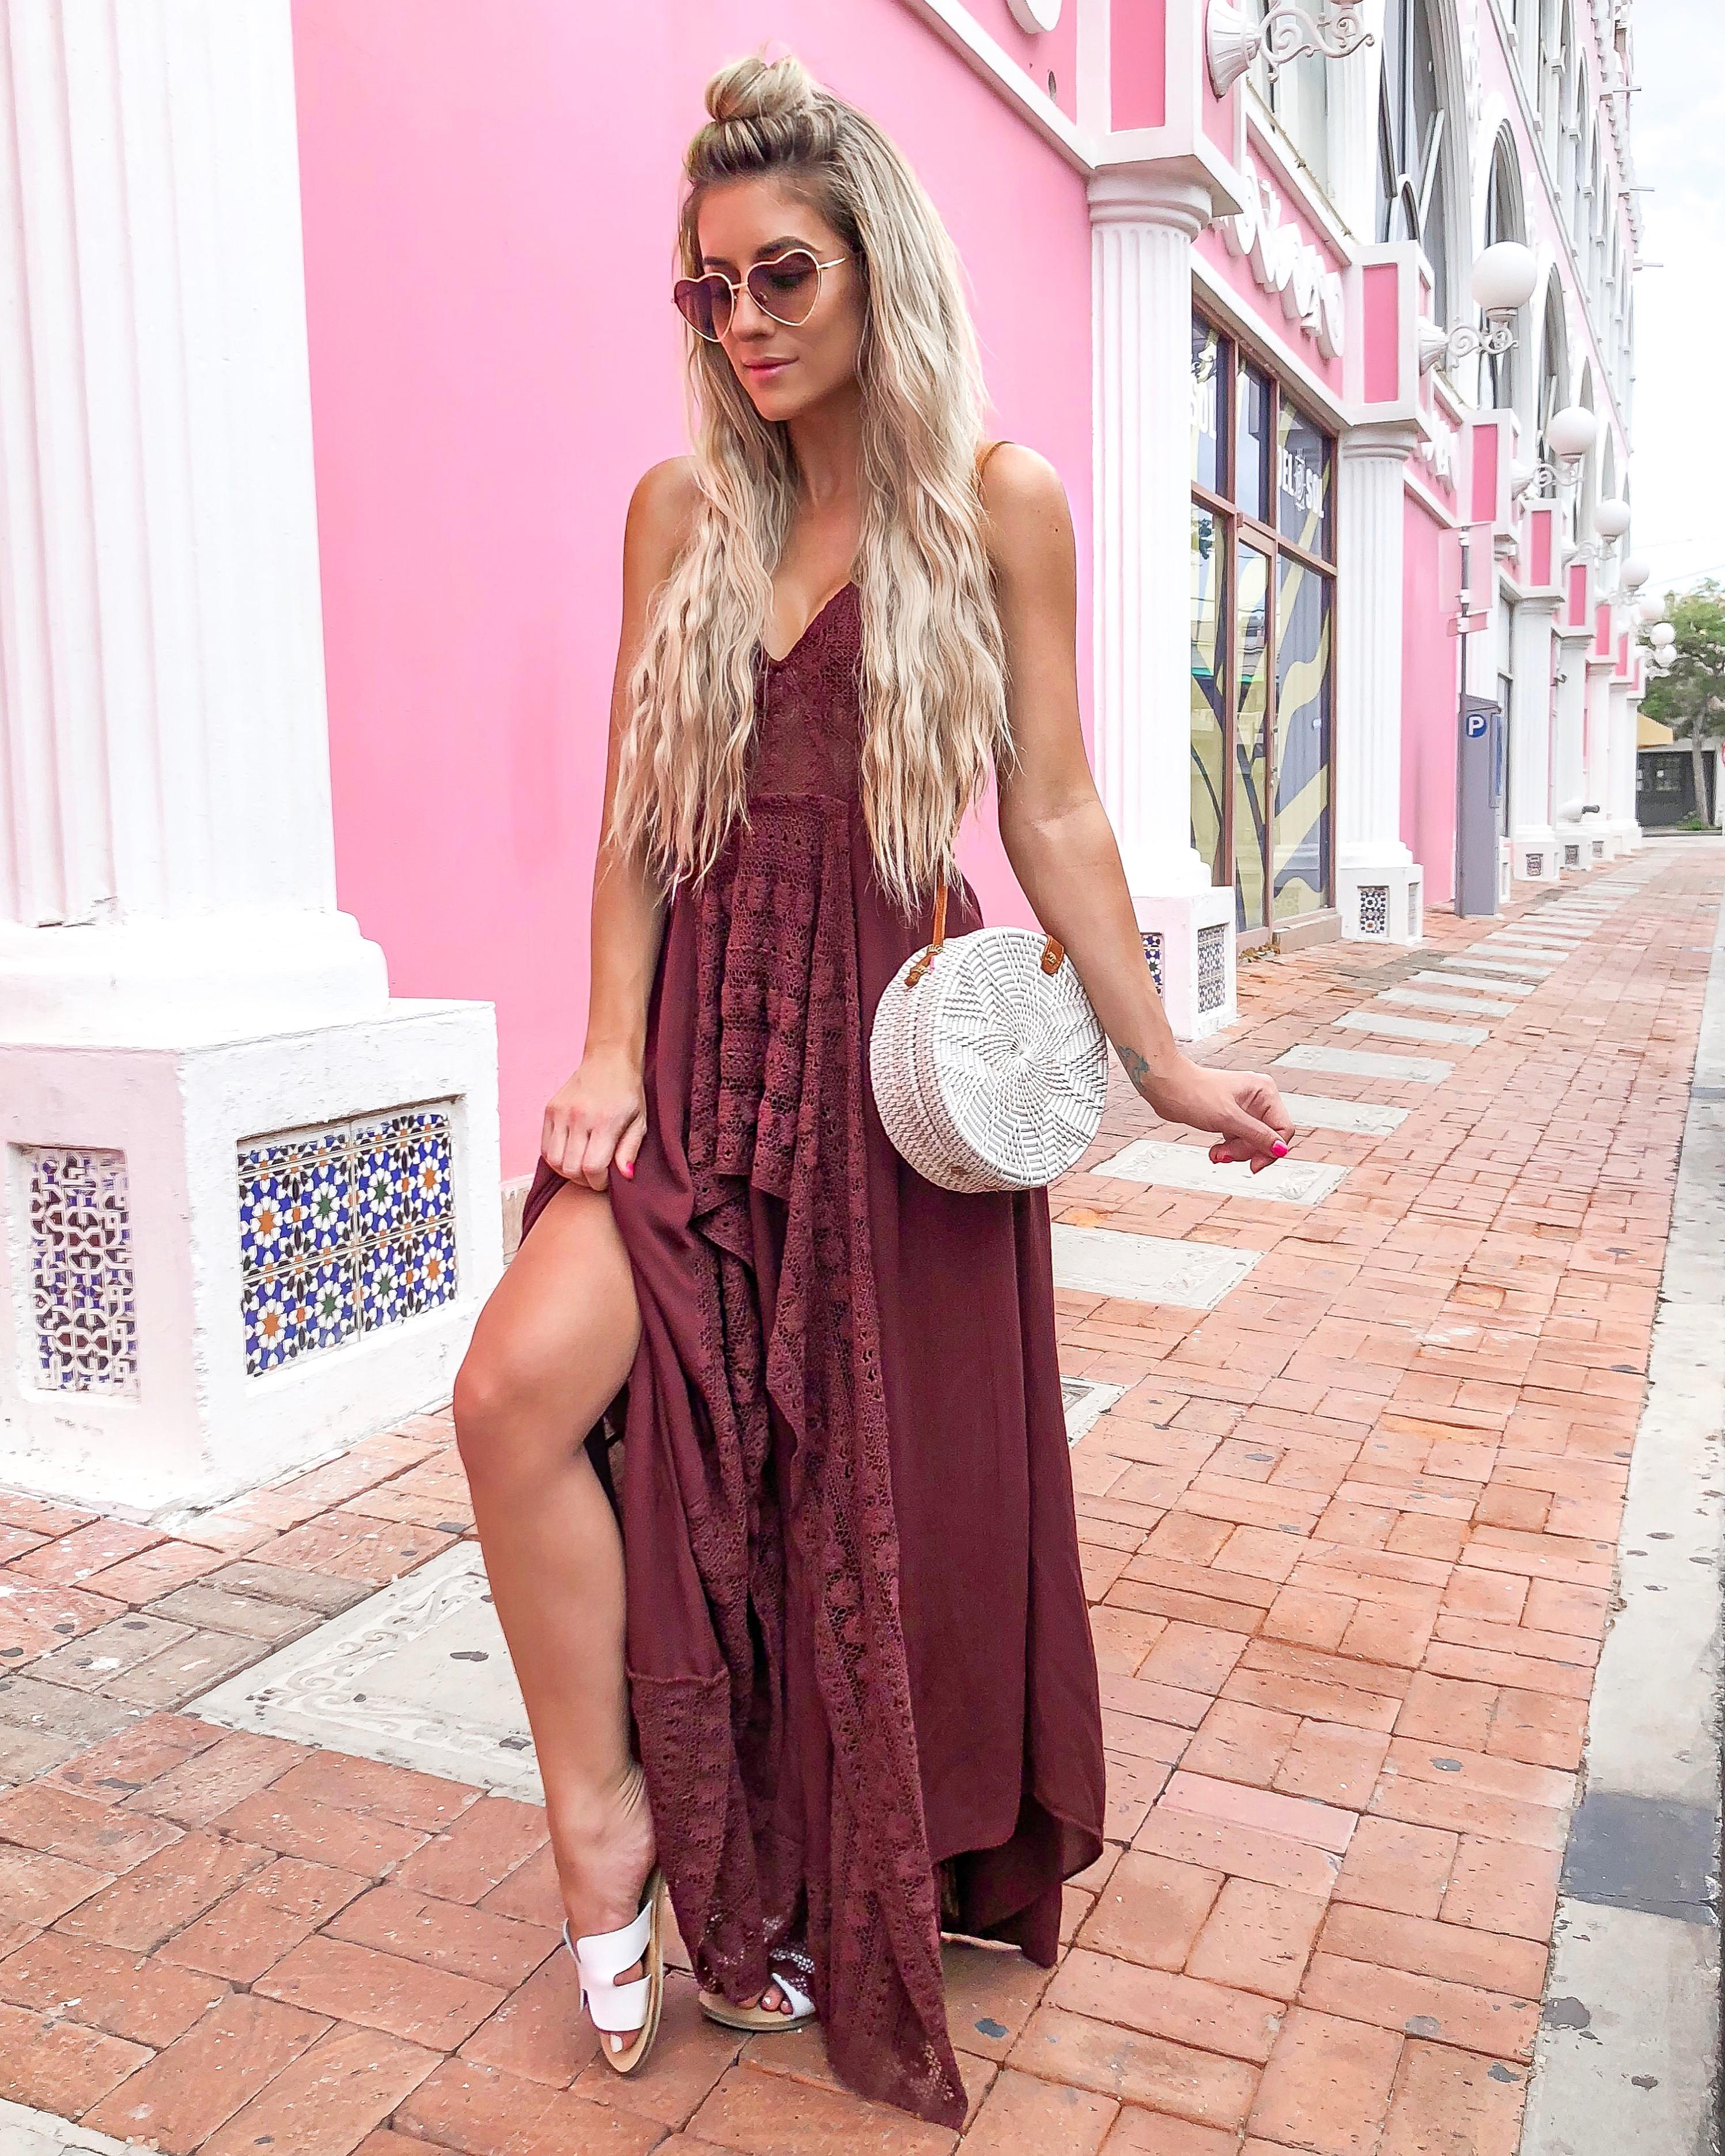 Free People Maxi Dress Aruba Travel guide